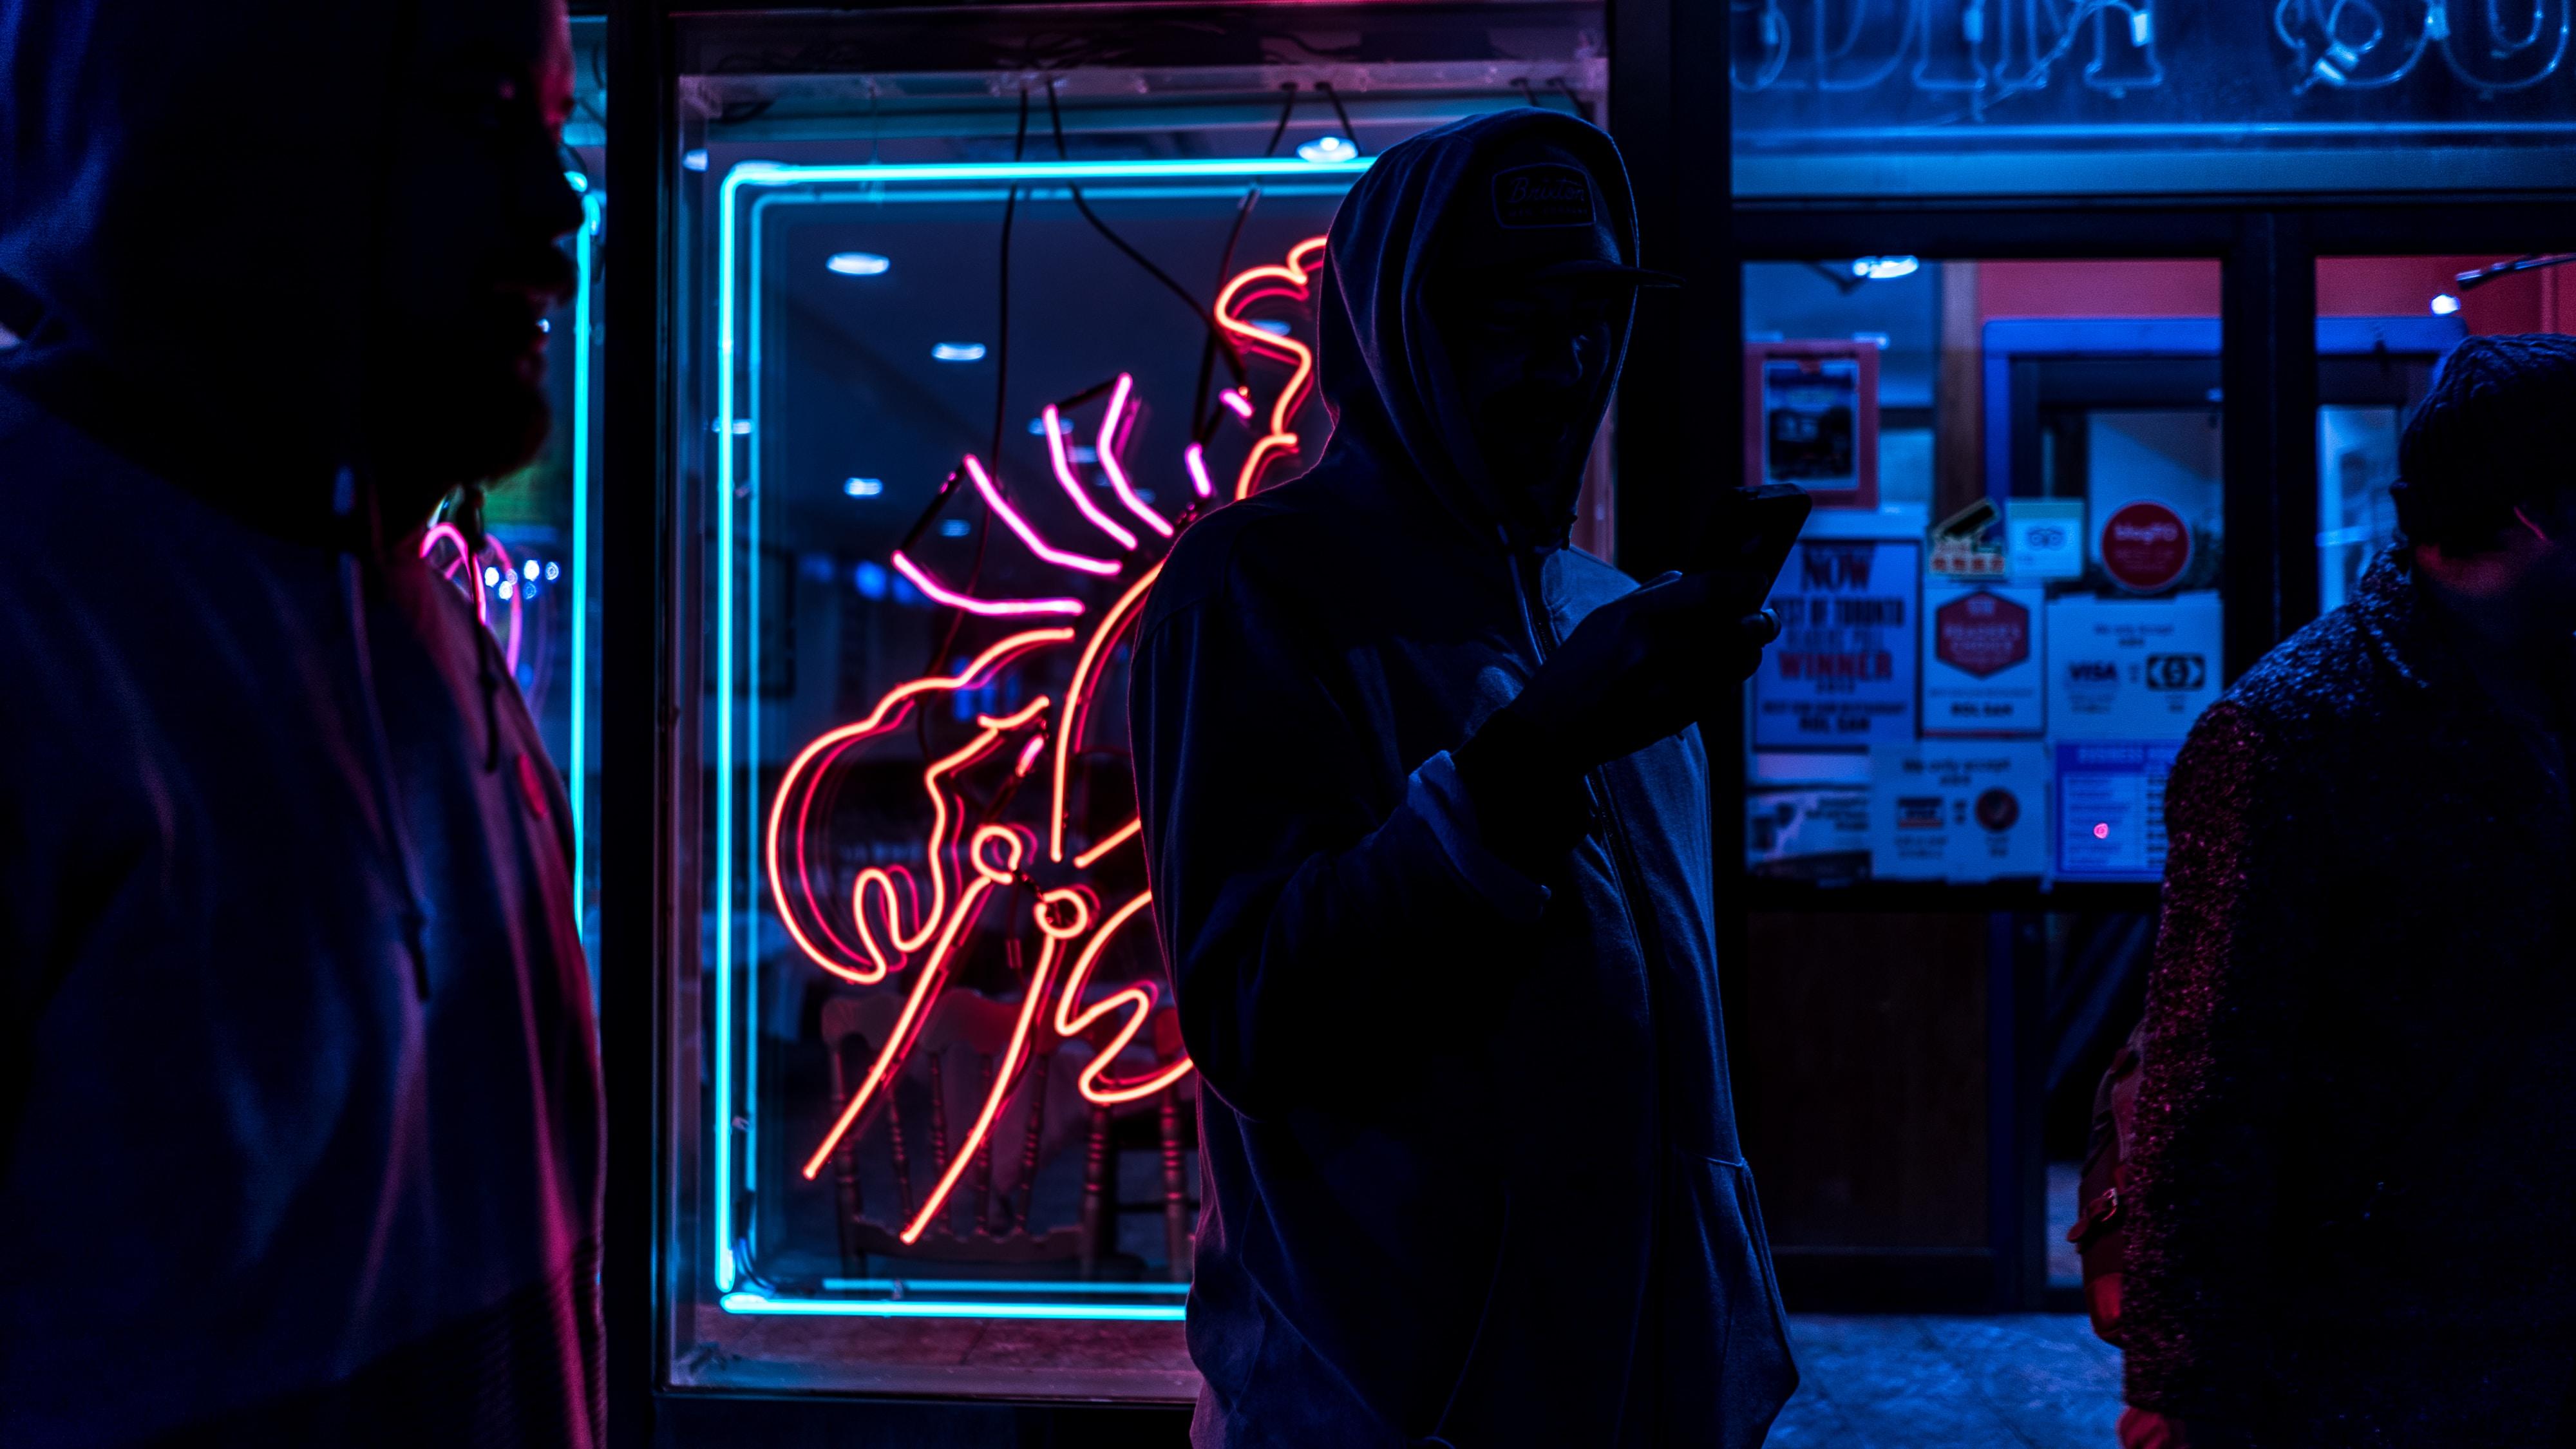 man standing holding smartphone